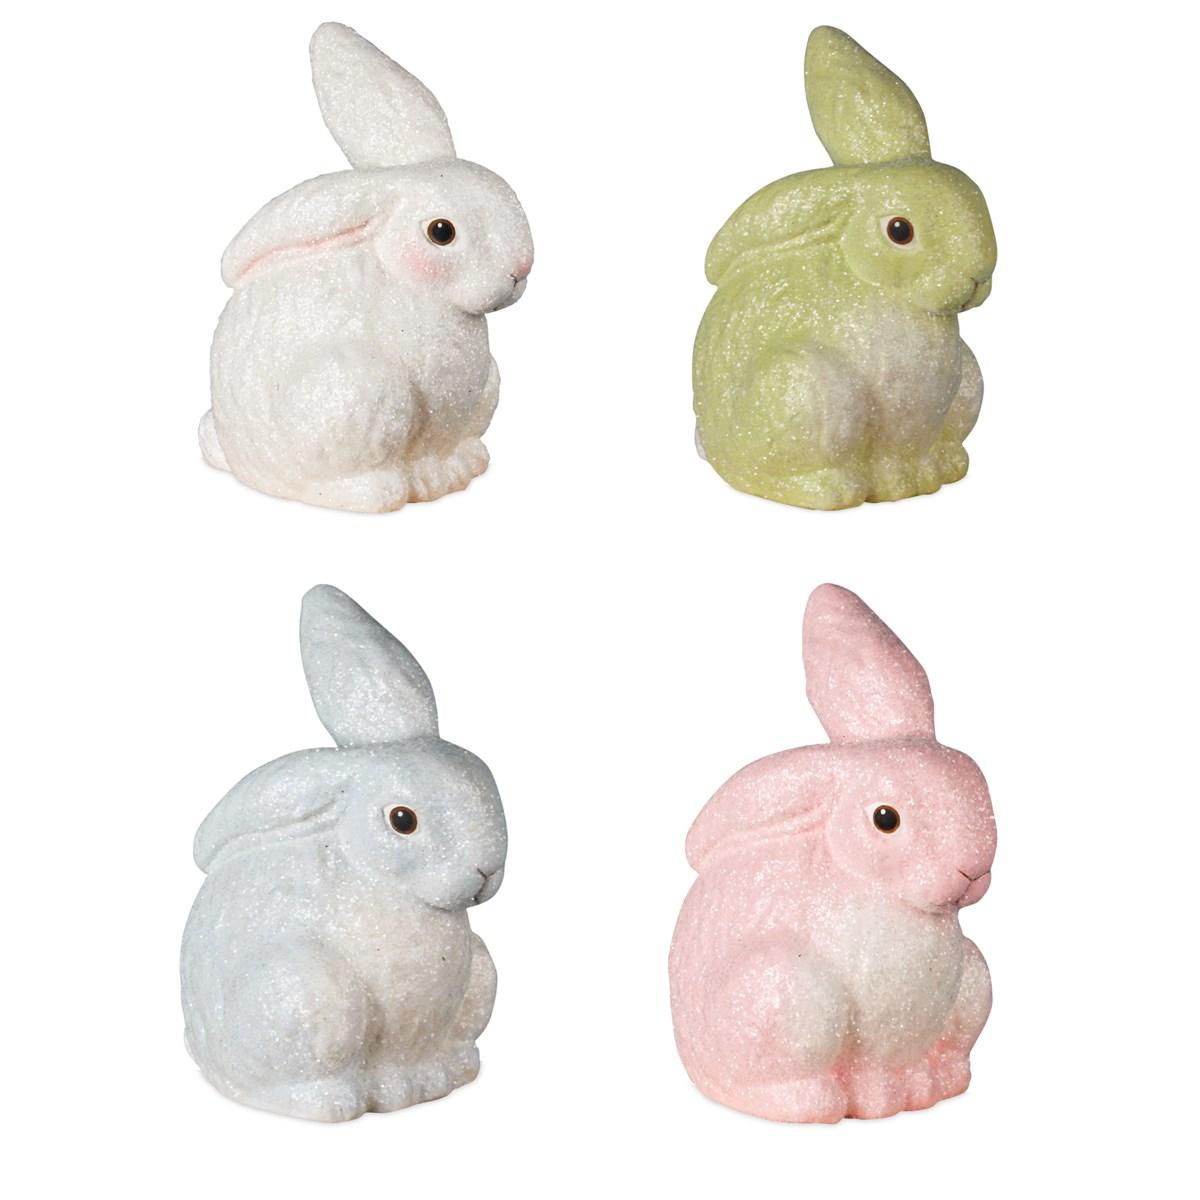 Glittered Egg Dye Bunny 4A